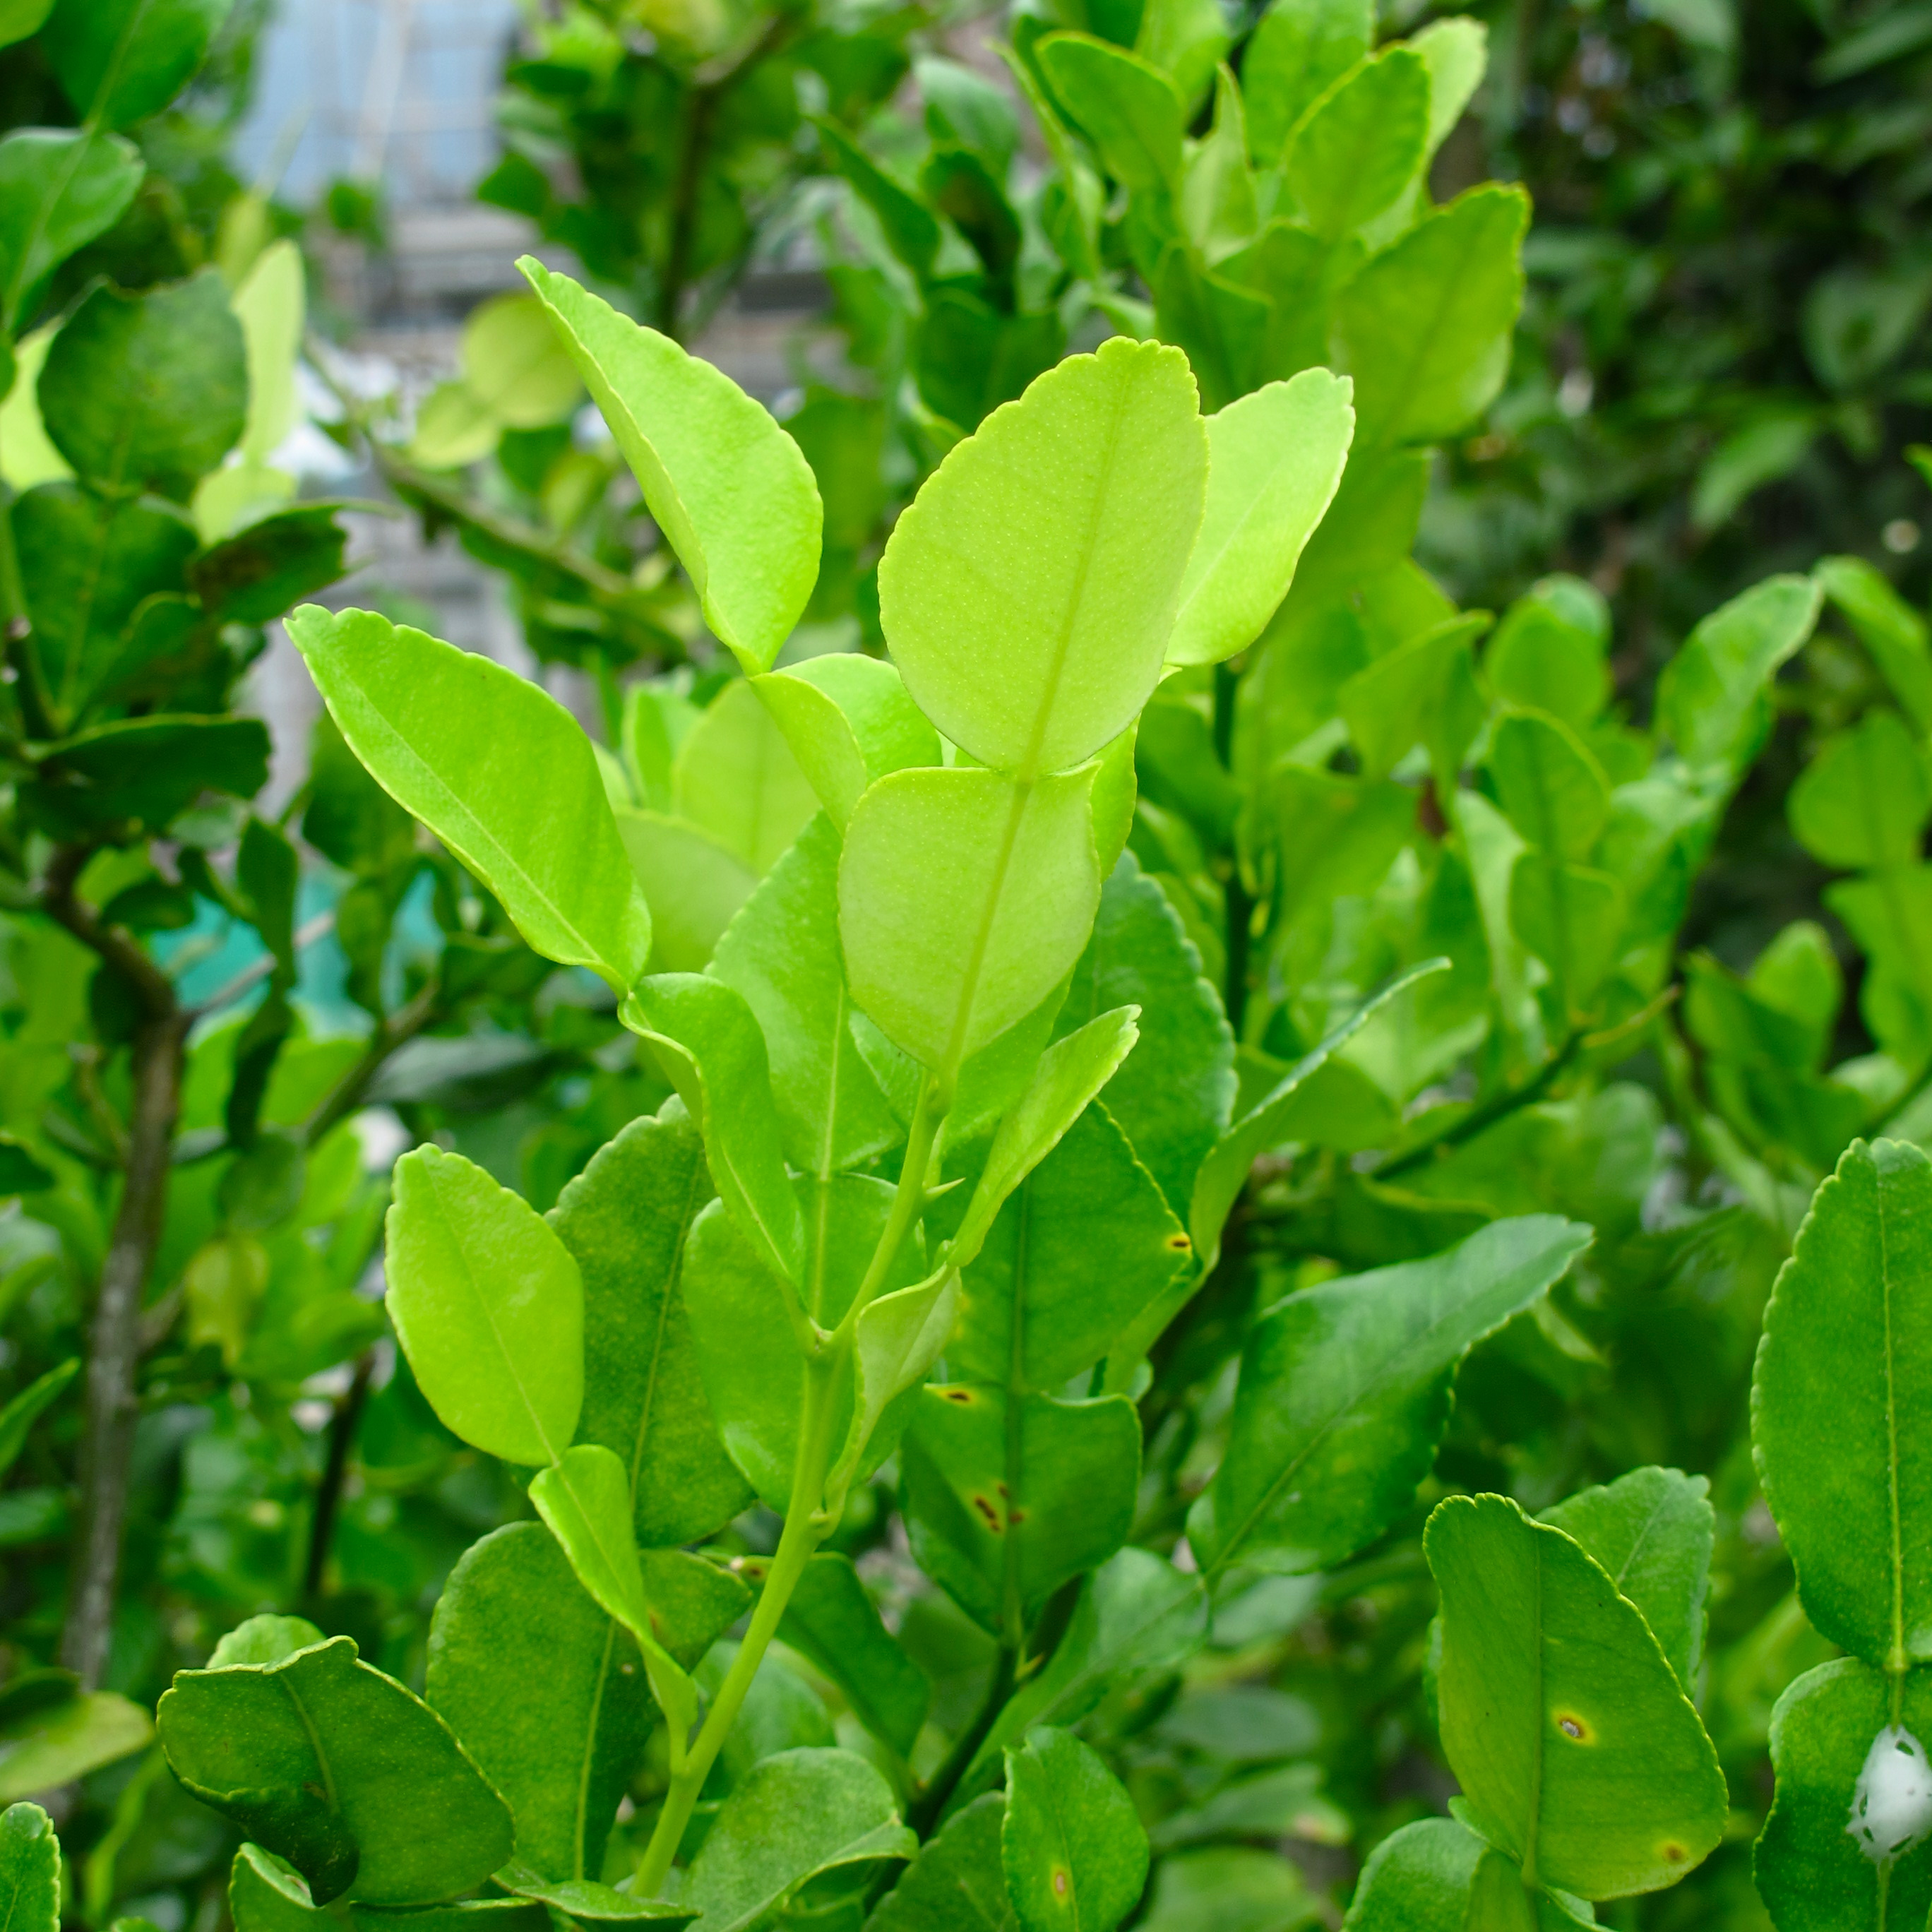 kaffir lime leaves - Kaffir Lime Tree